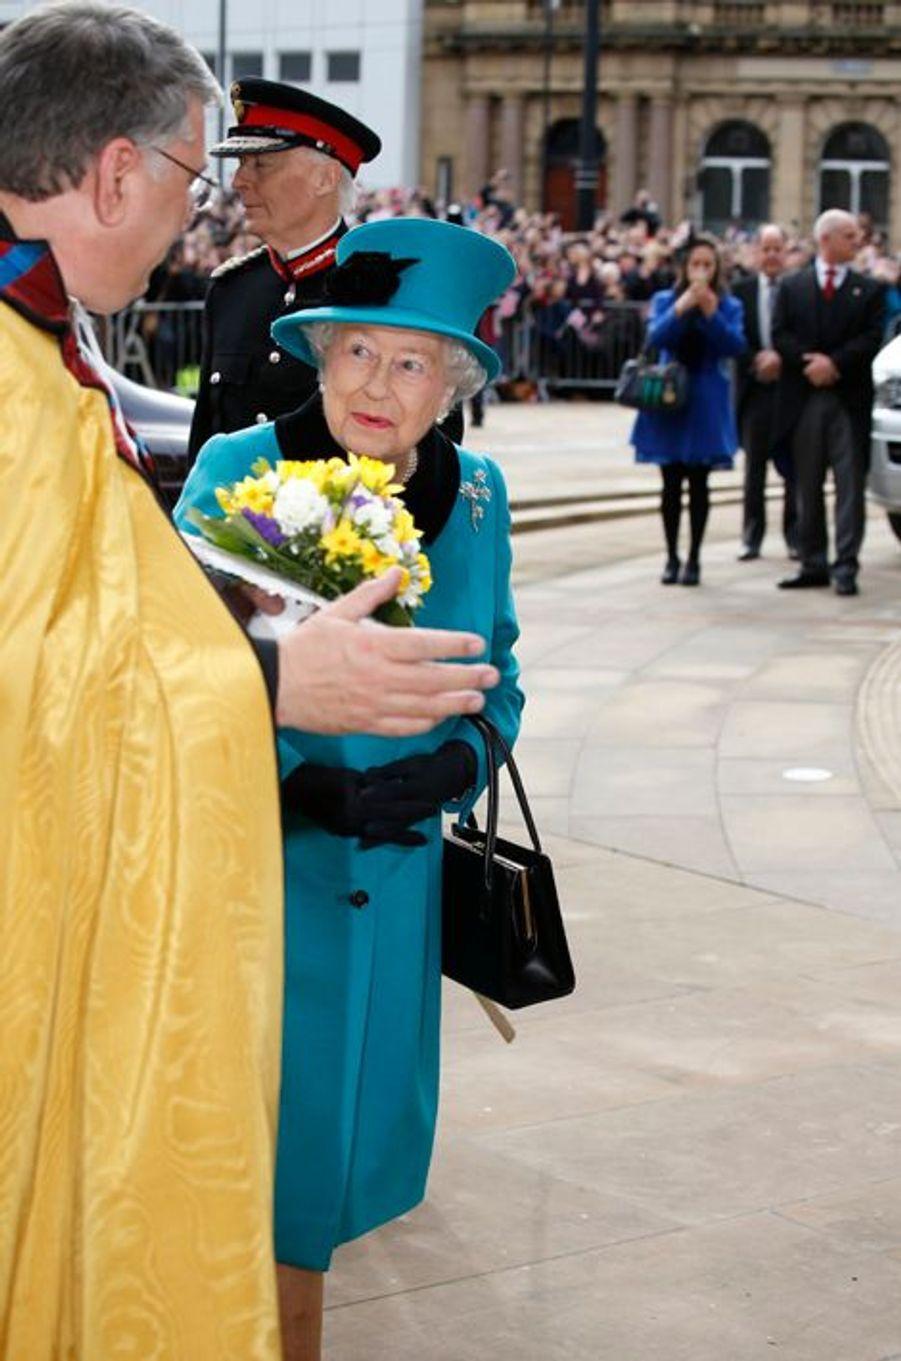 La reine Elizabeth II au Maundy Service du Jeudi Saint à Sheffield, le 2 avril 2015